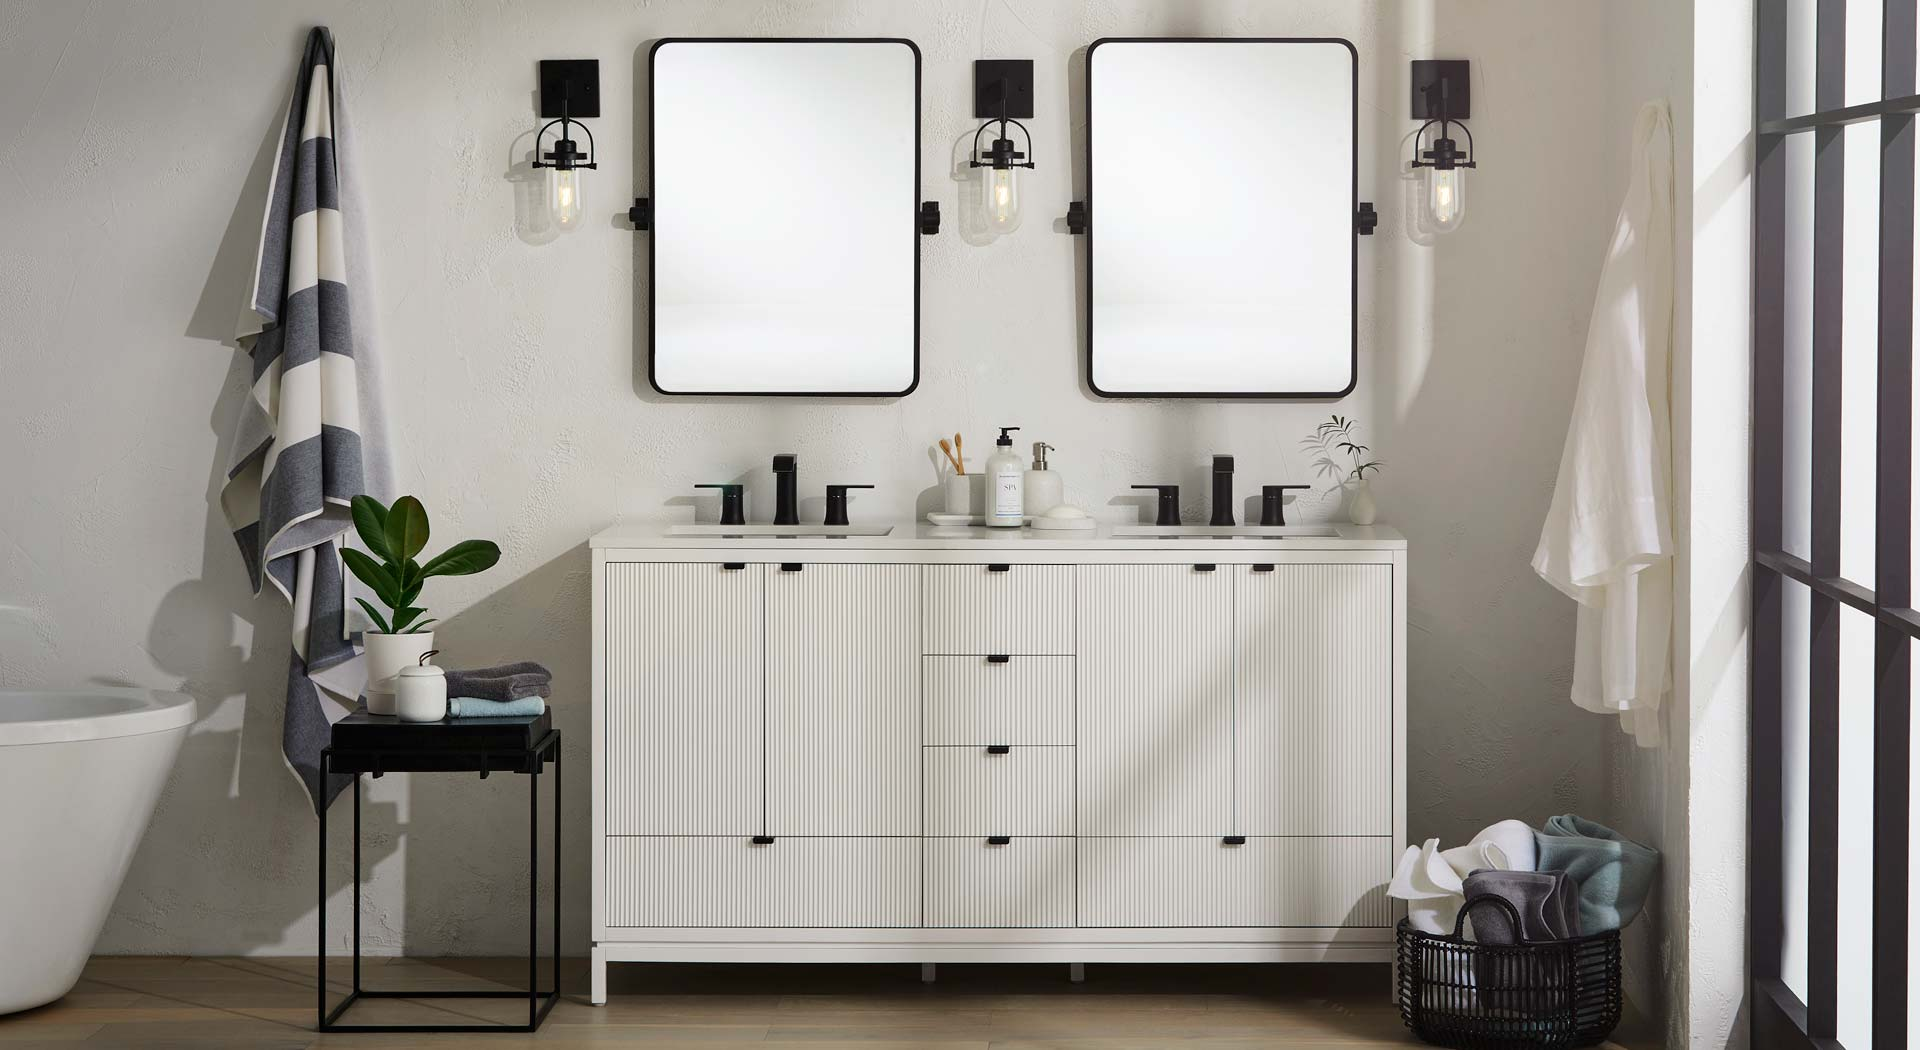 GlucksteinElements Bathroom Vanities